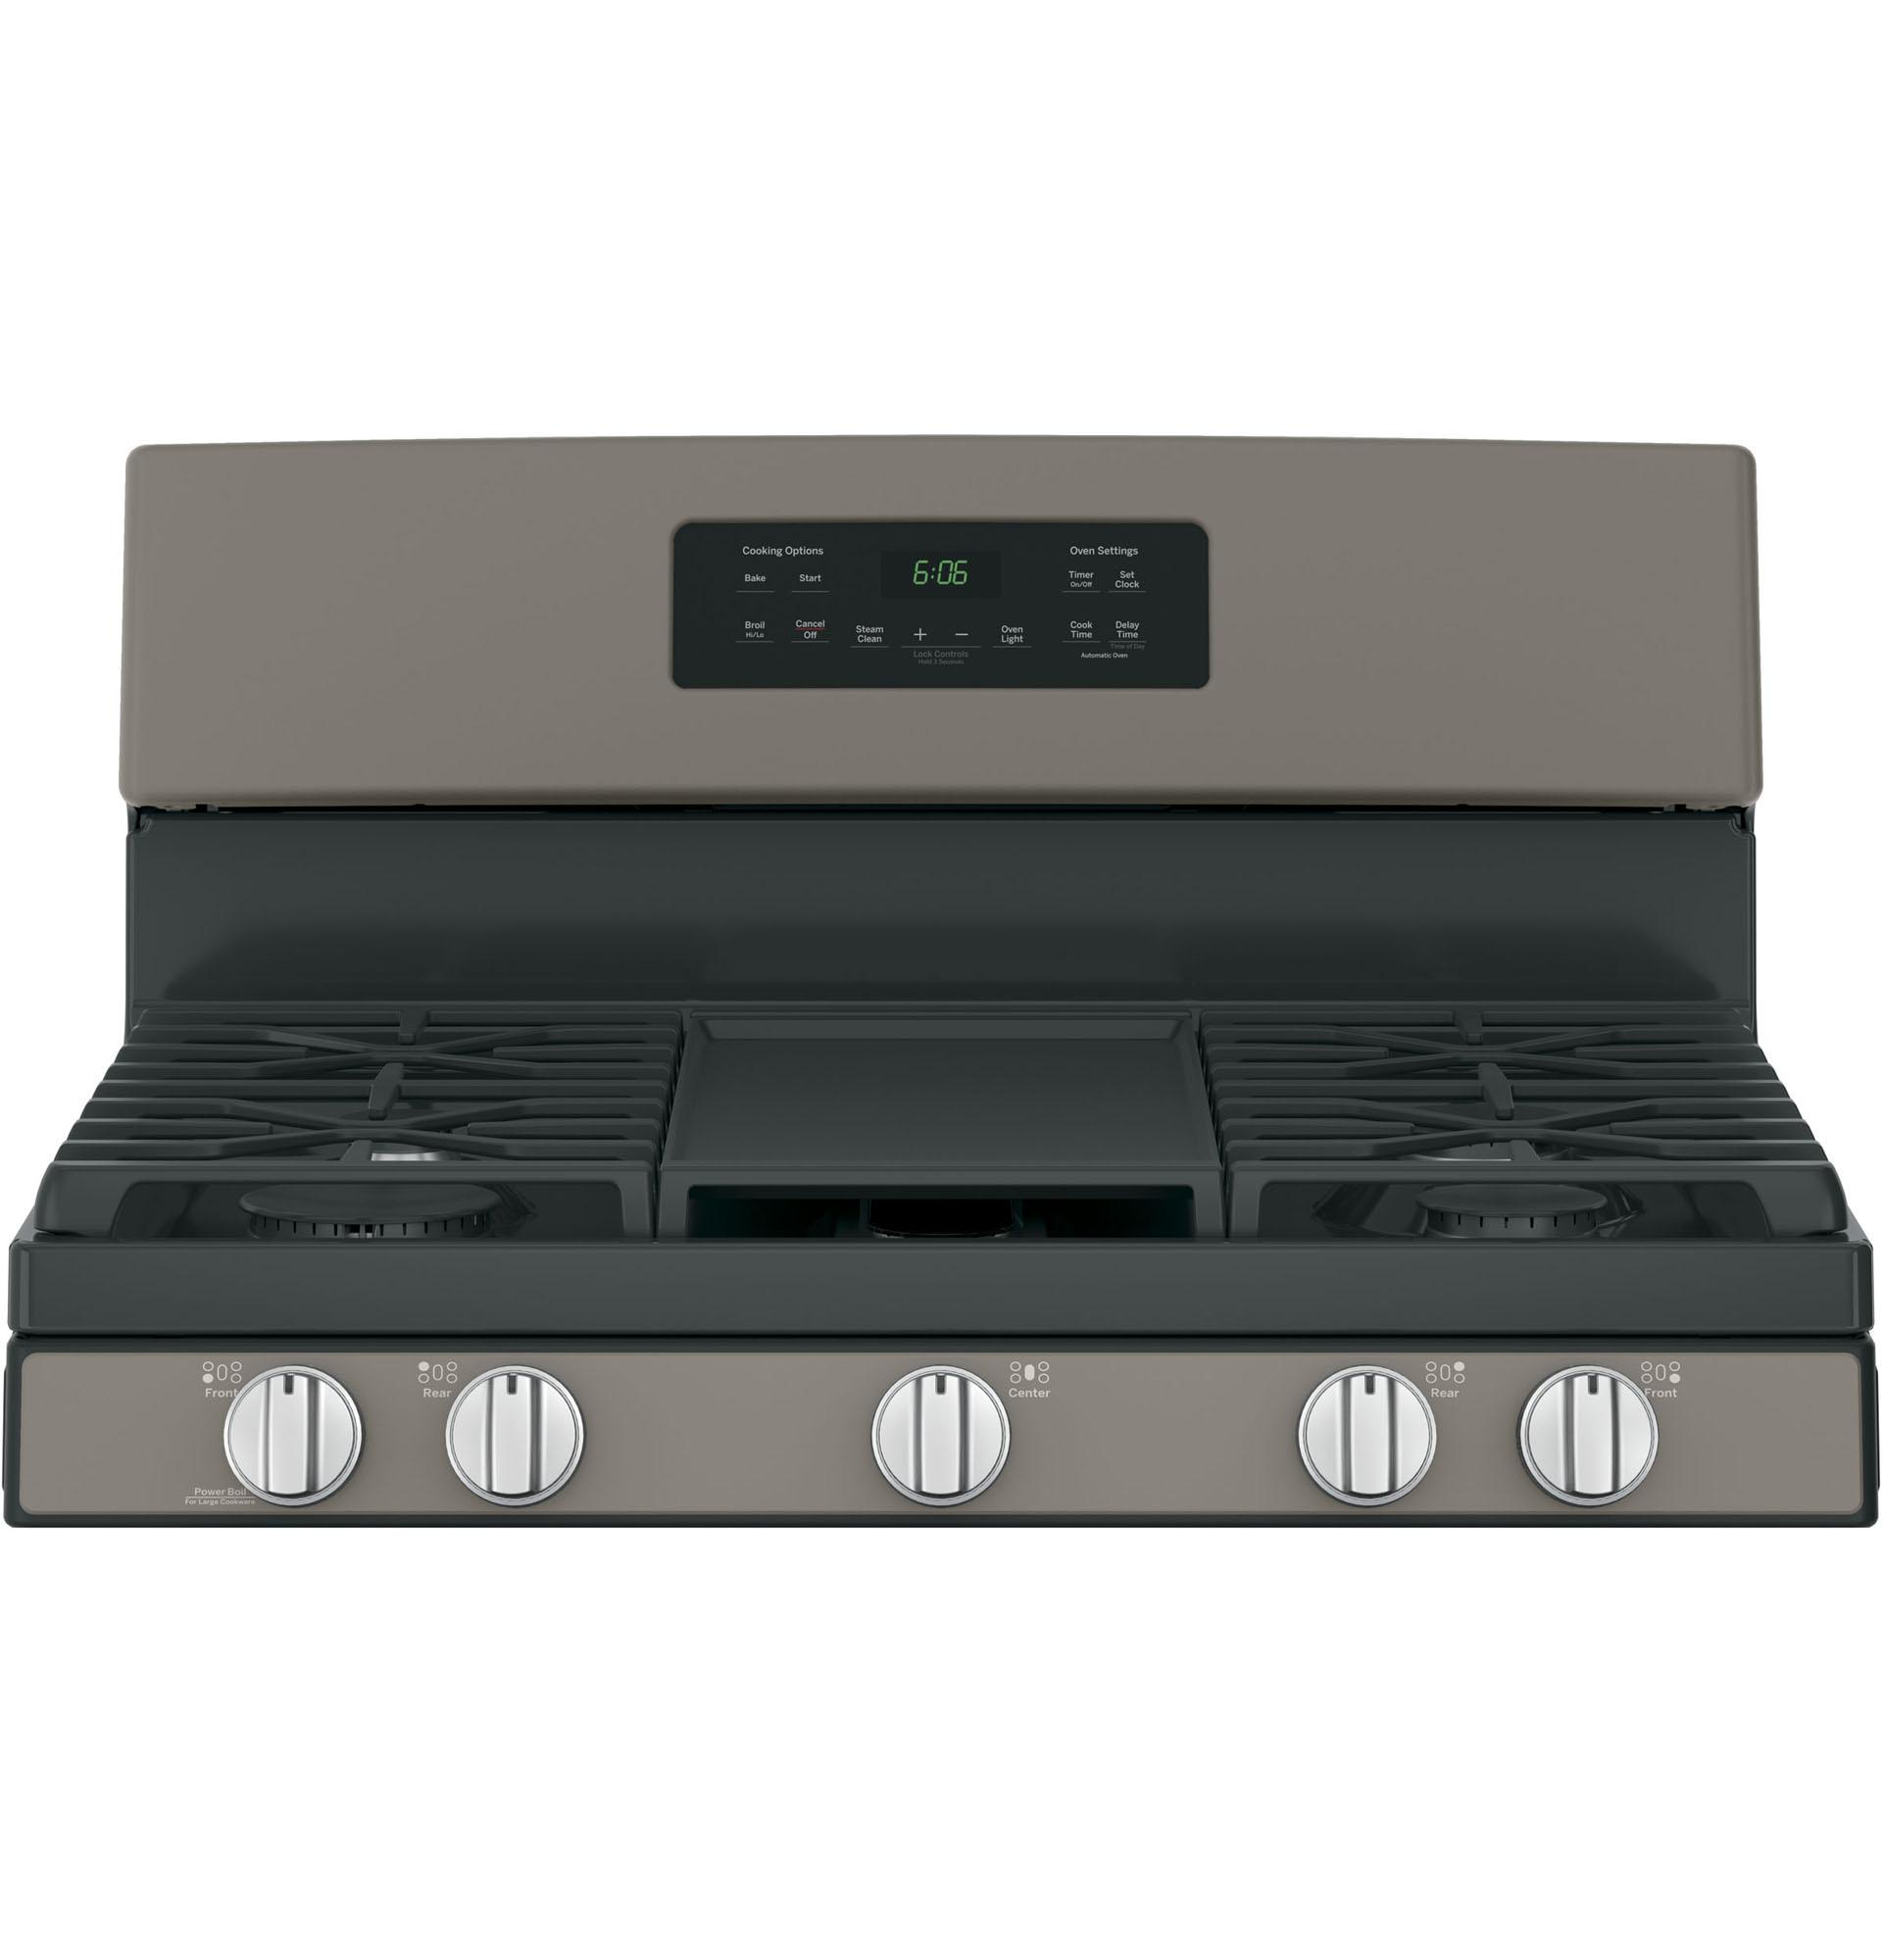 "GE Appliances JGBS66EEKES 30"" Freestanding Gas Range - Slate"